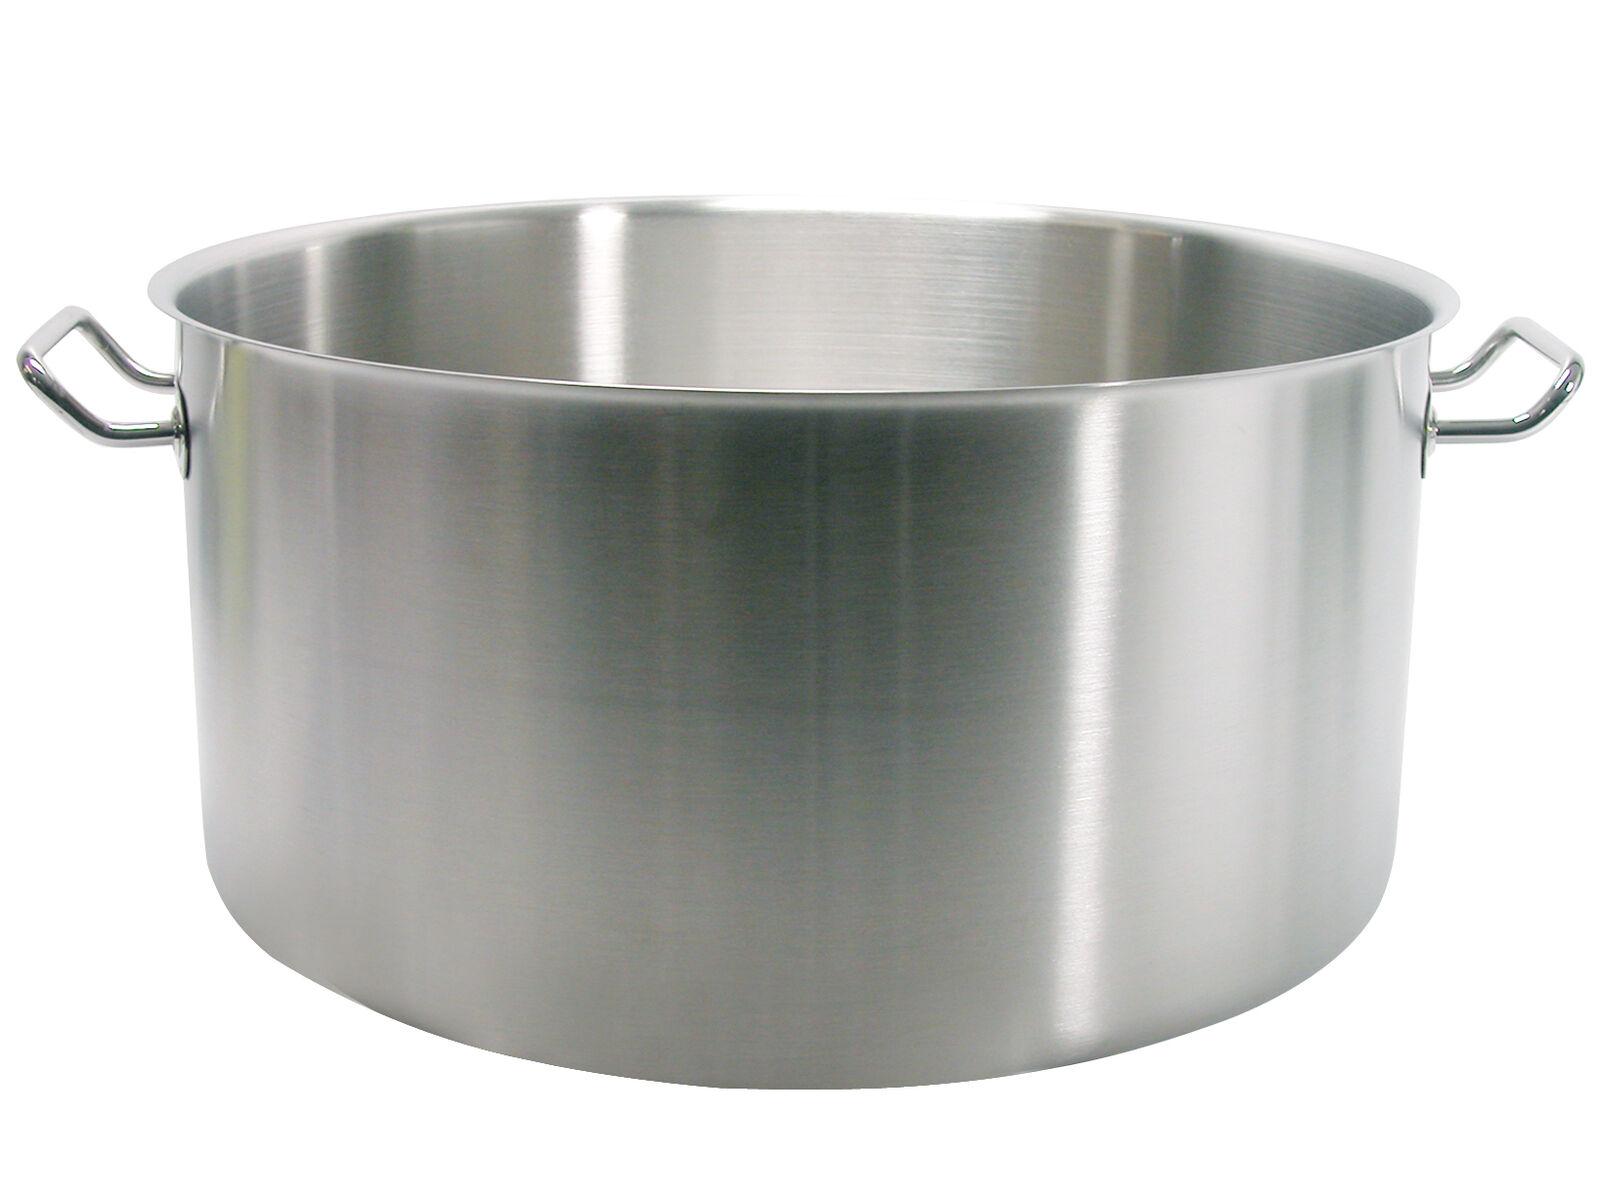 PARDINI Casseruola inox albergo media 2 manici Cm 40 pentola da cucina